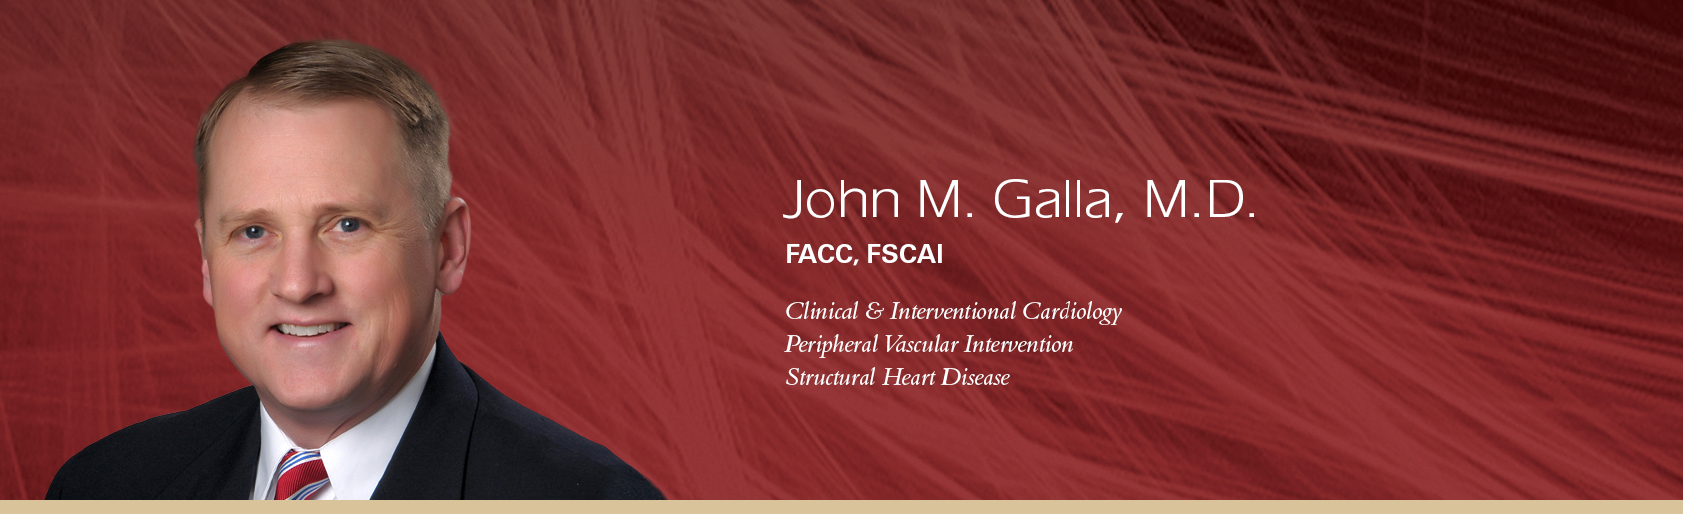 JohnGalla.jpg